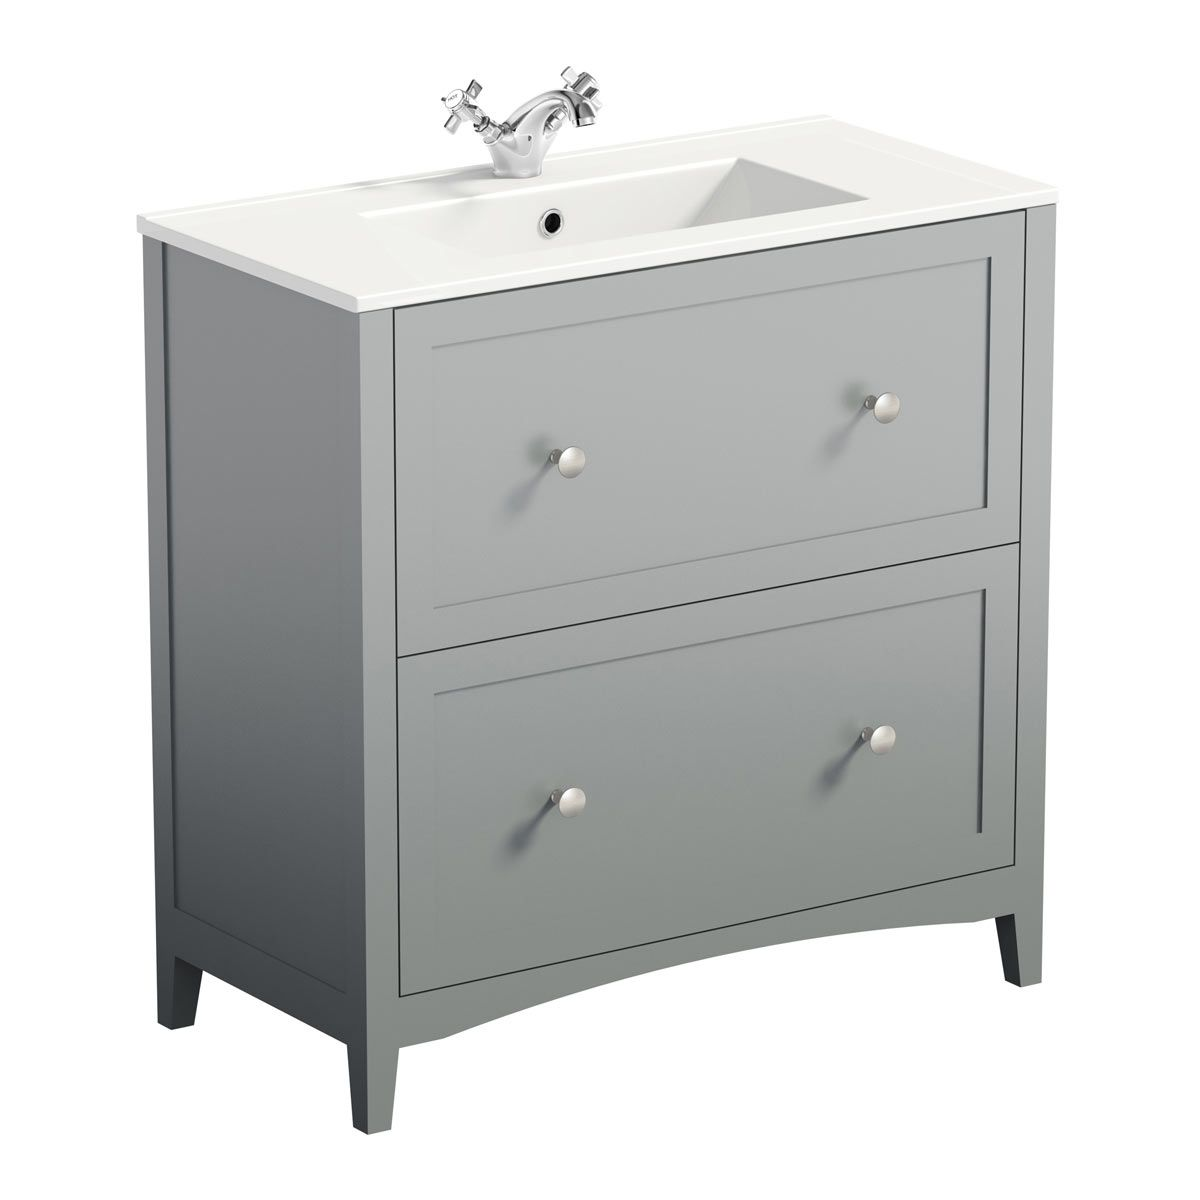 The Bath Co Camberley Satin Grey Floorstanding Vanity Unit And Ceramic Basin 800mm Vanity Units Grey Vanity Unit Basin Vanity Unit